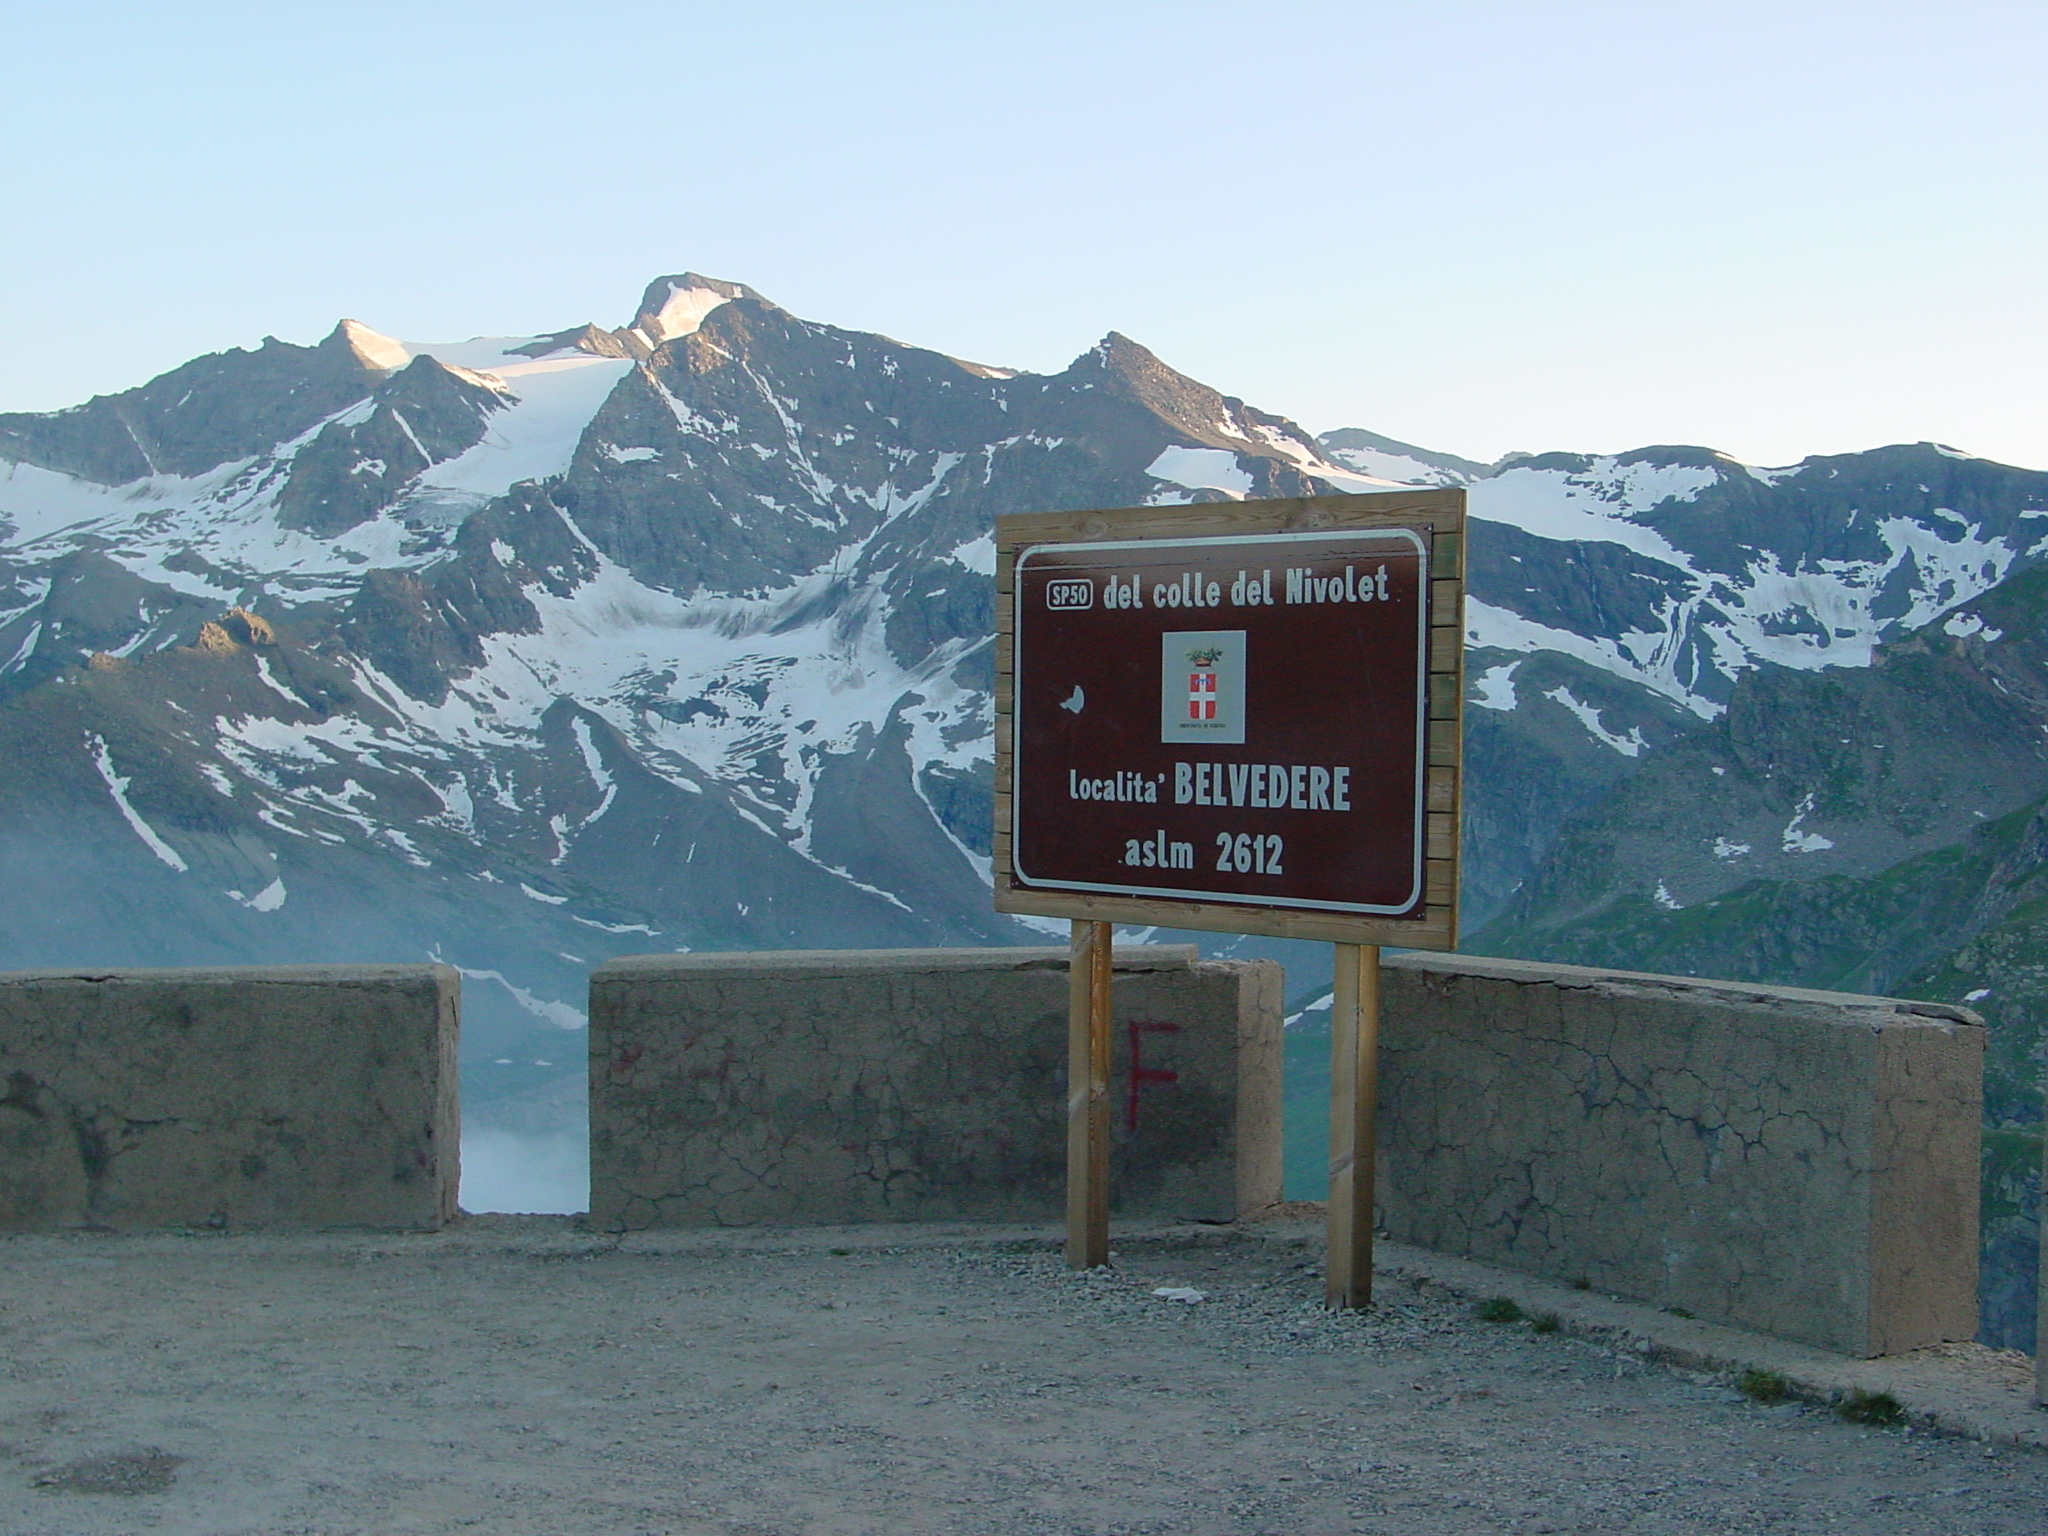 Click image for larger version  Name:Nivolet Belvedere sign.JPG Views:8 Size:1.32 MB ID:197248